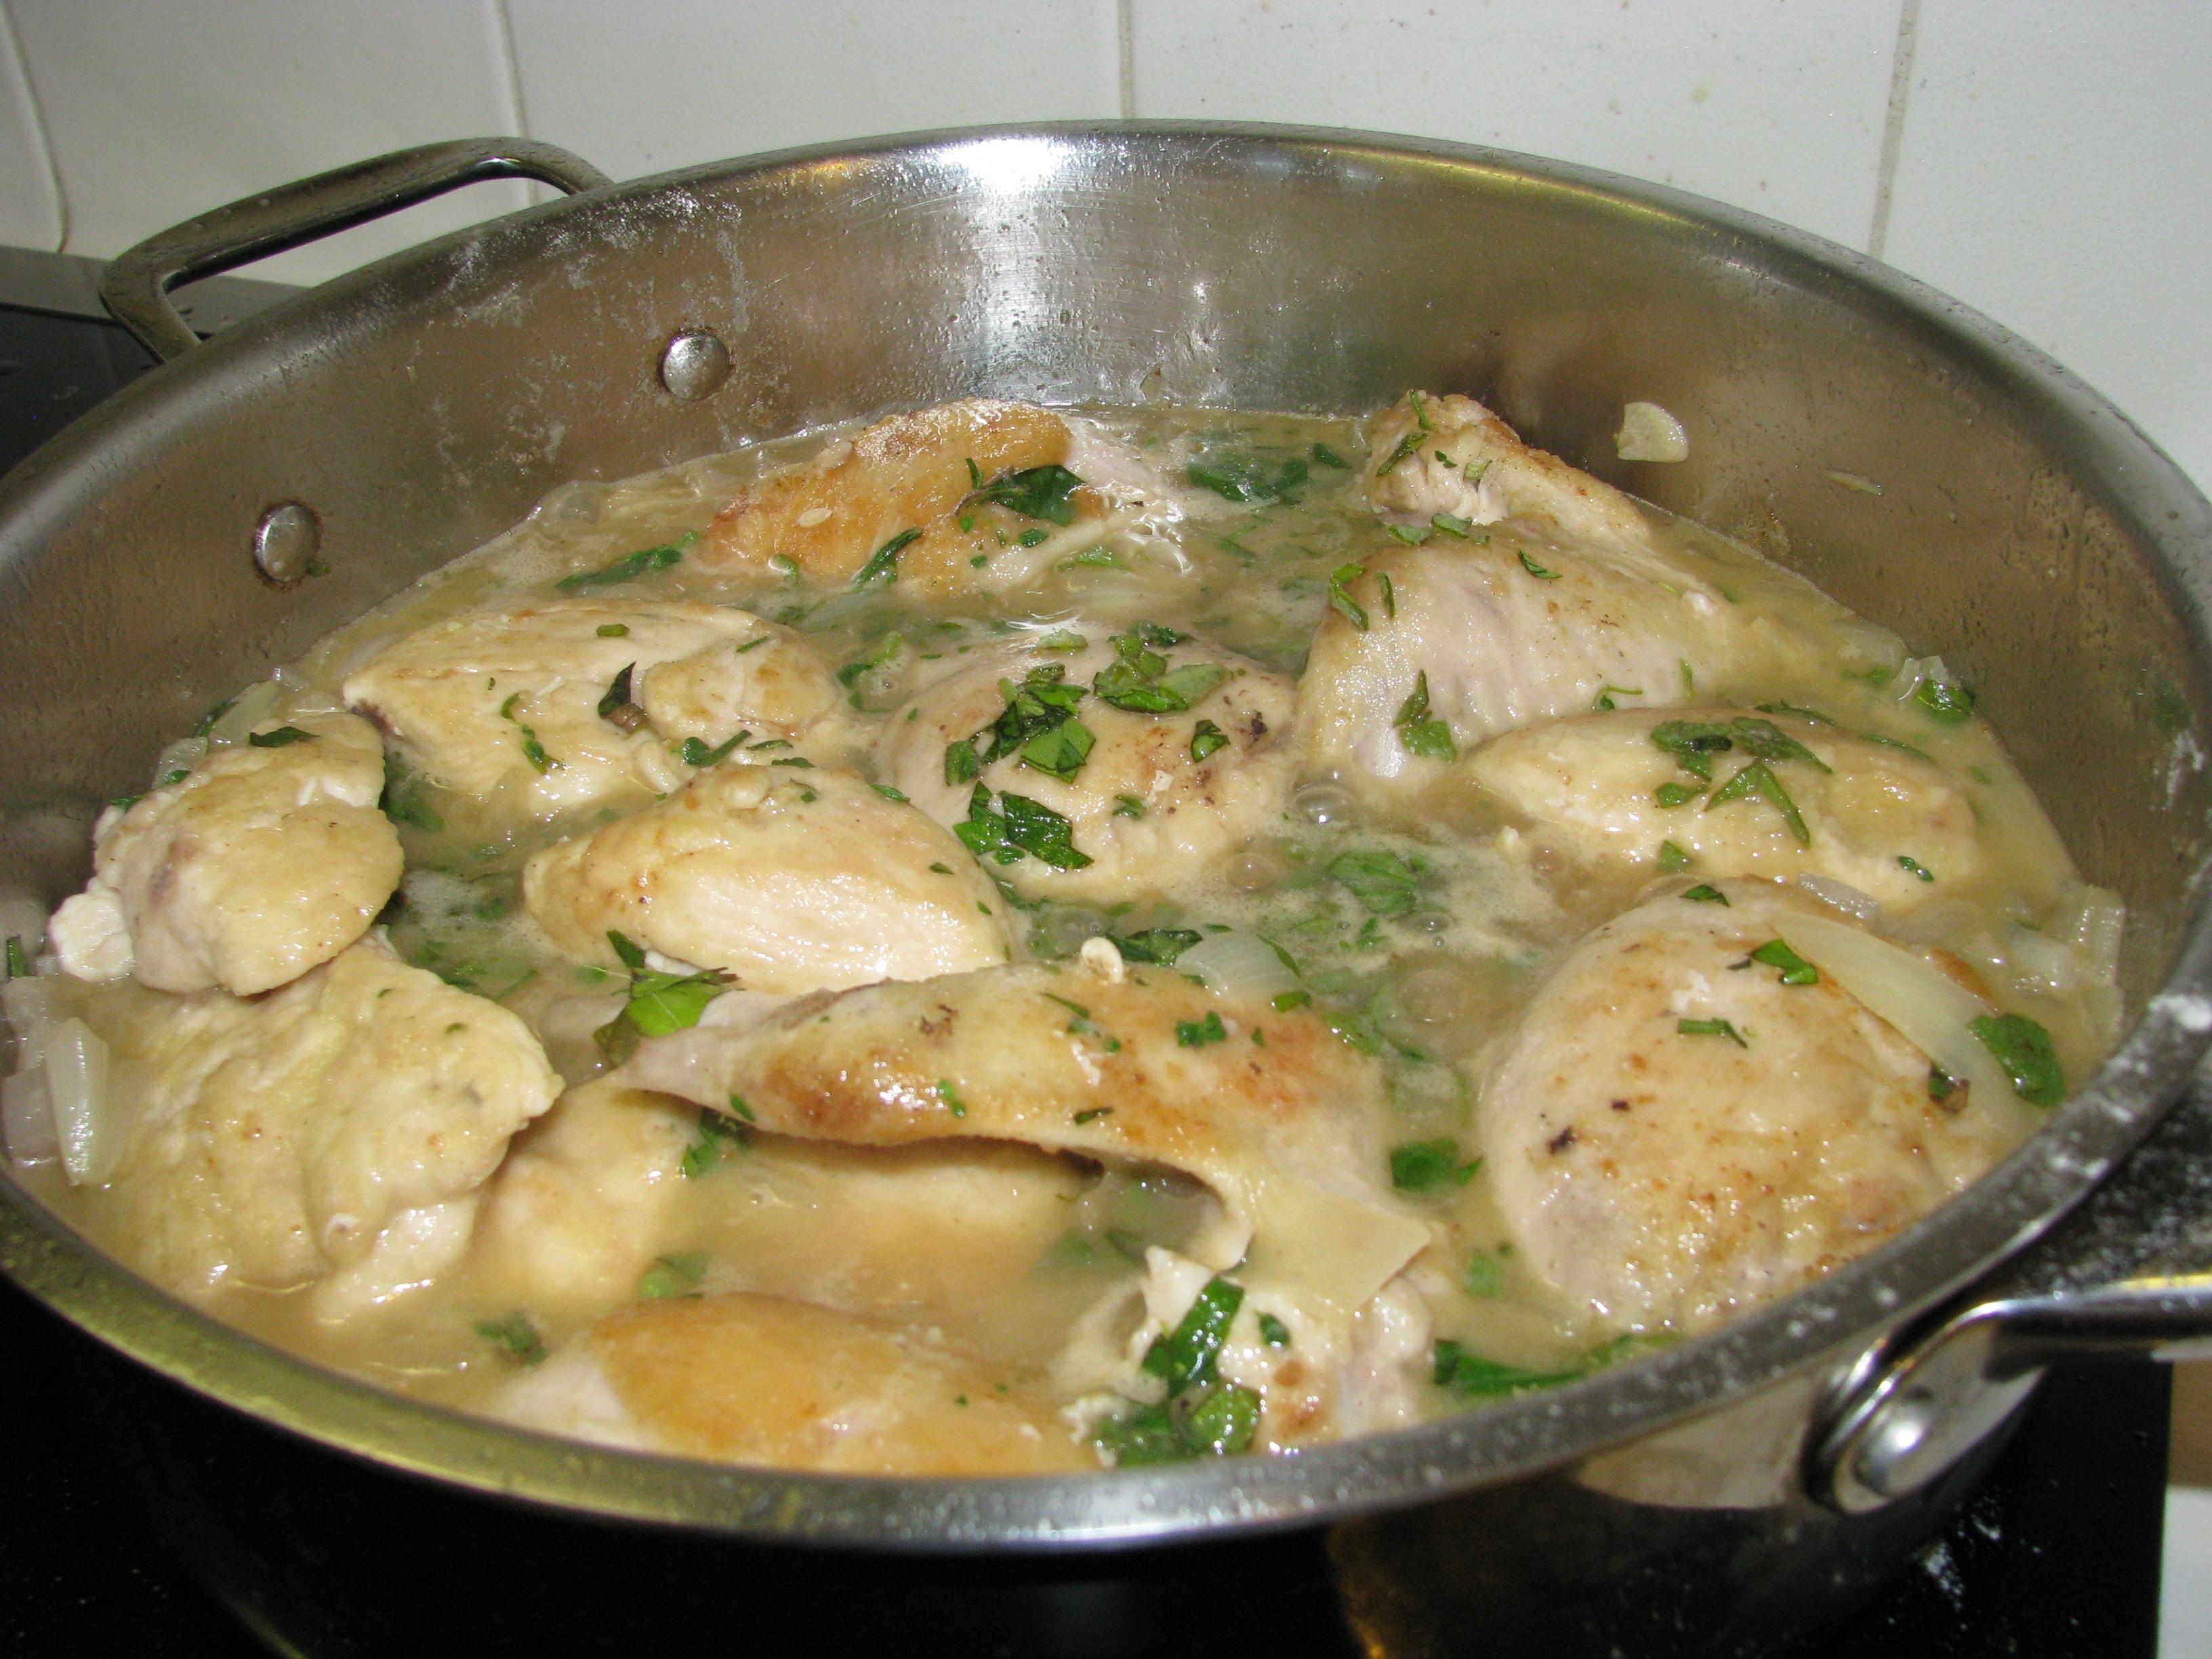 Umbrian Style Chicken Cacciatore